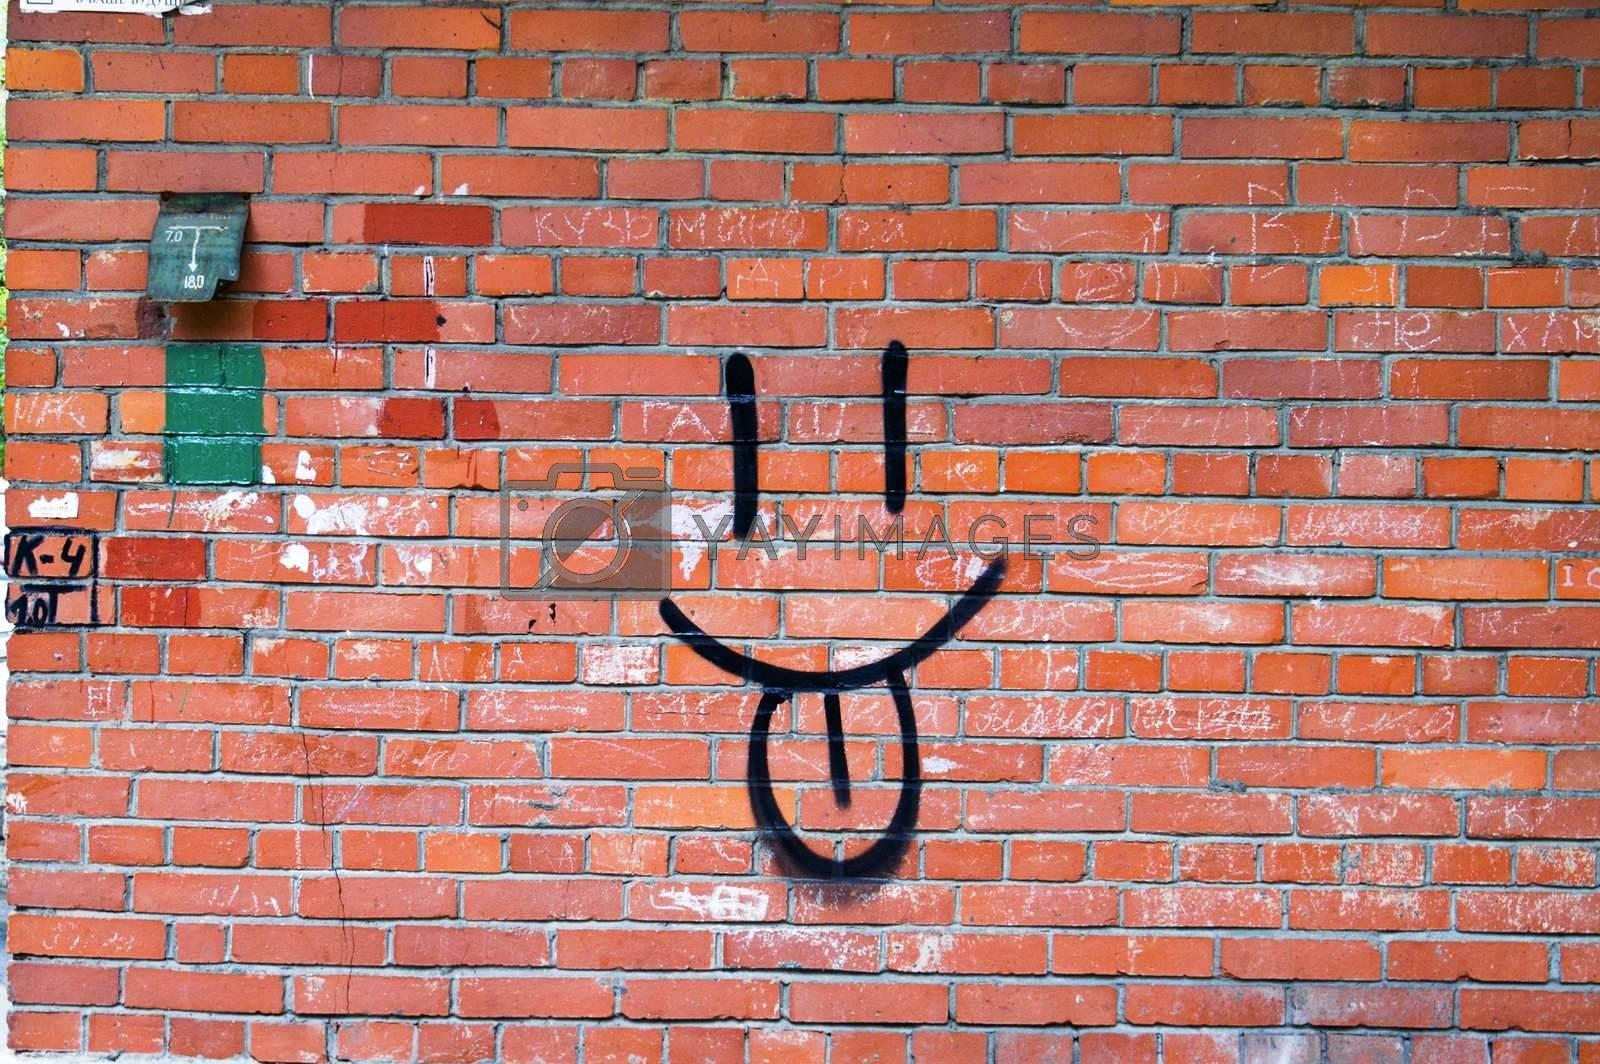 Smile Graffiti on Red Brick Wall.